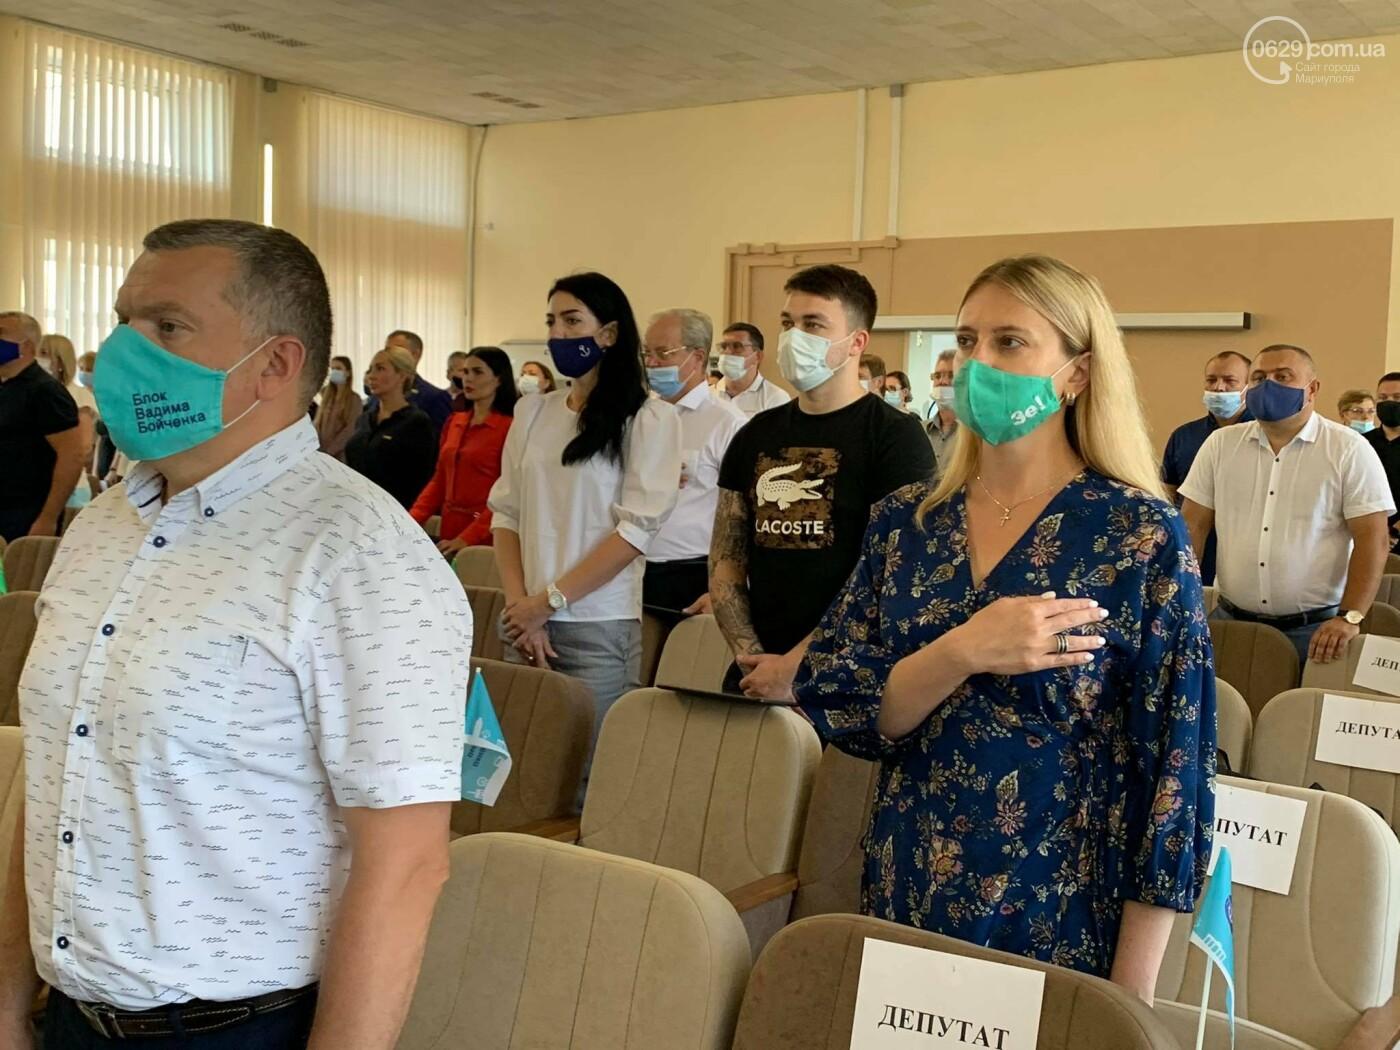 В Мариуполе стартовала сессия горсовета, - ФОТО, фото-3